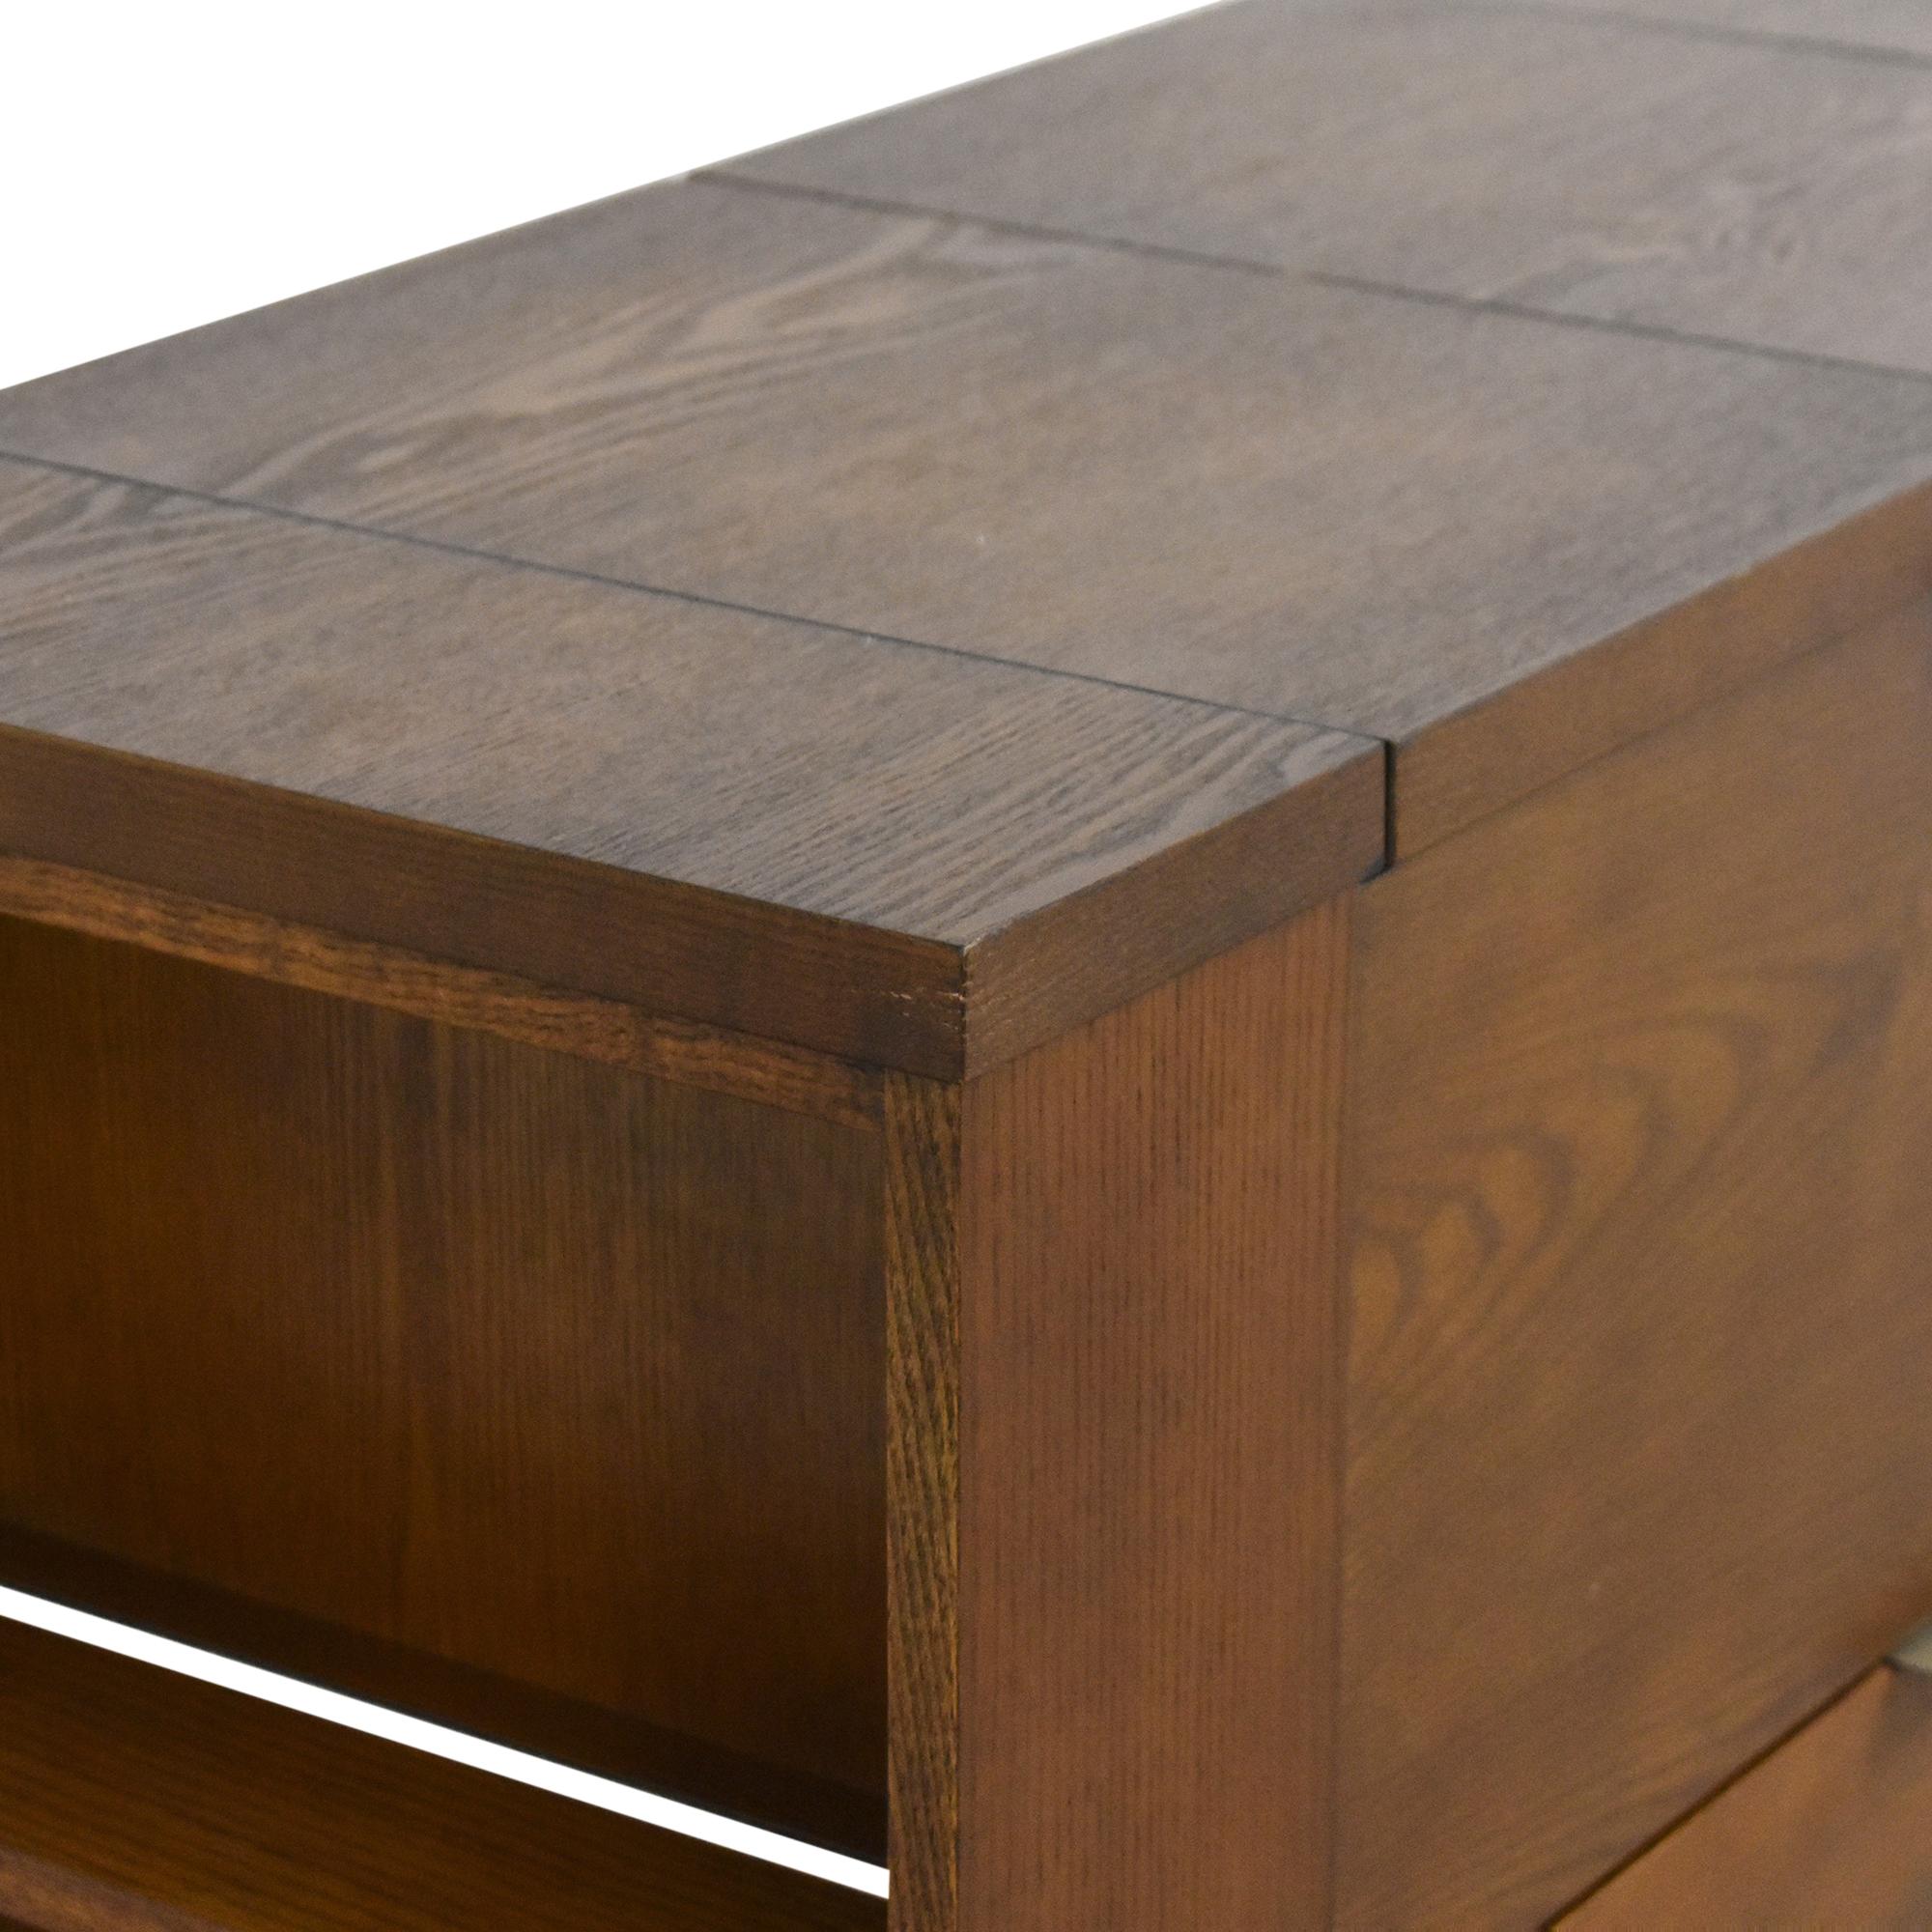 Crate & Barrel Parker Spirits Bourbon Cabinet Crate & Barrel